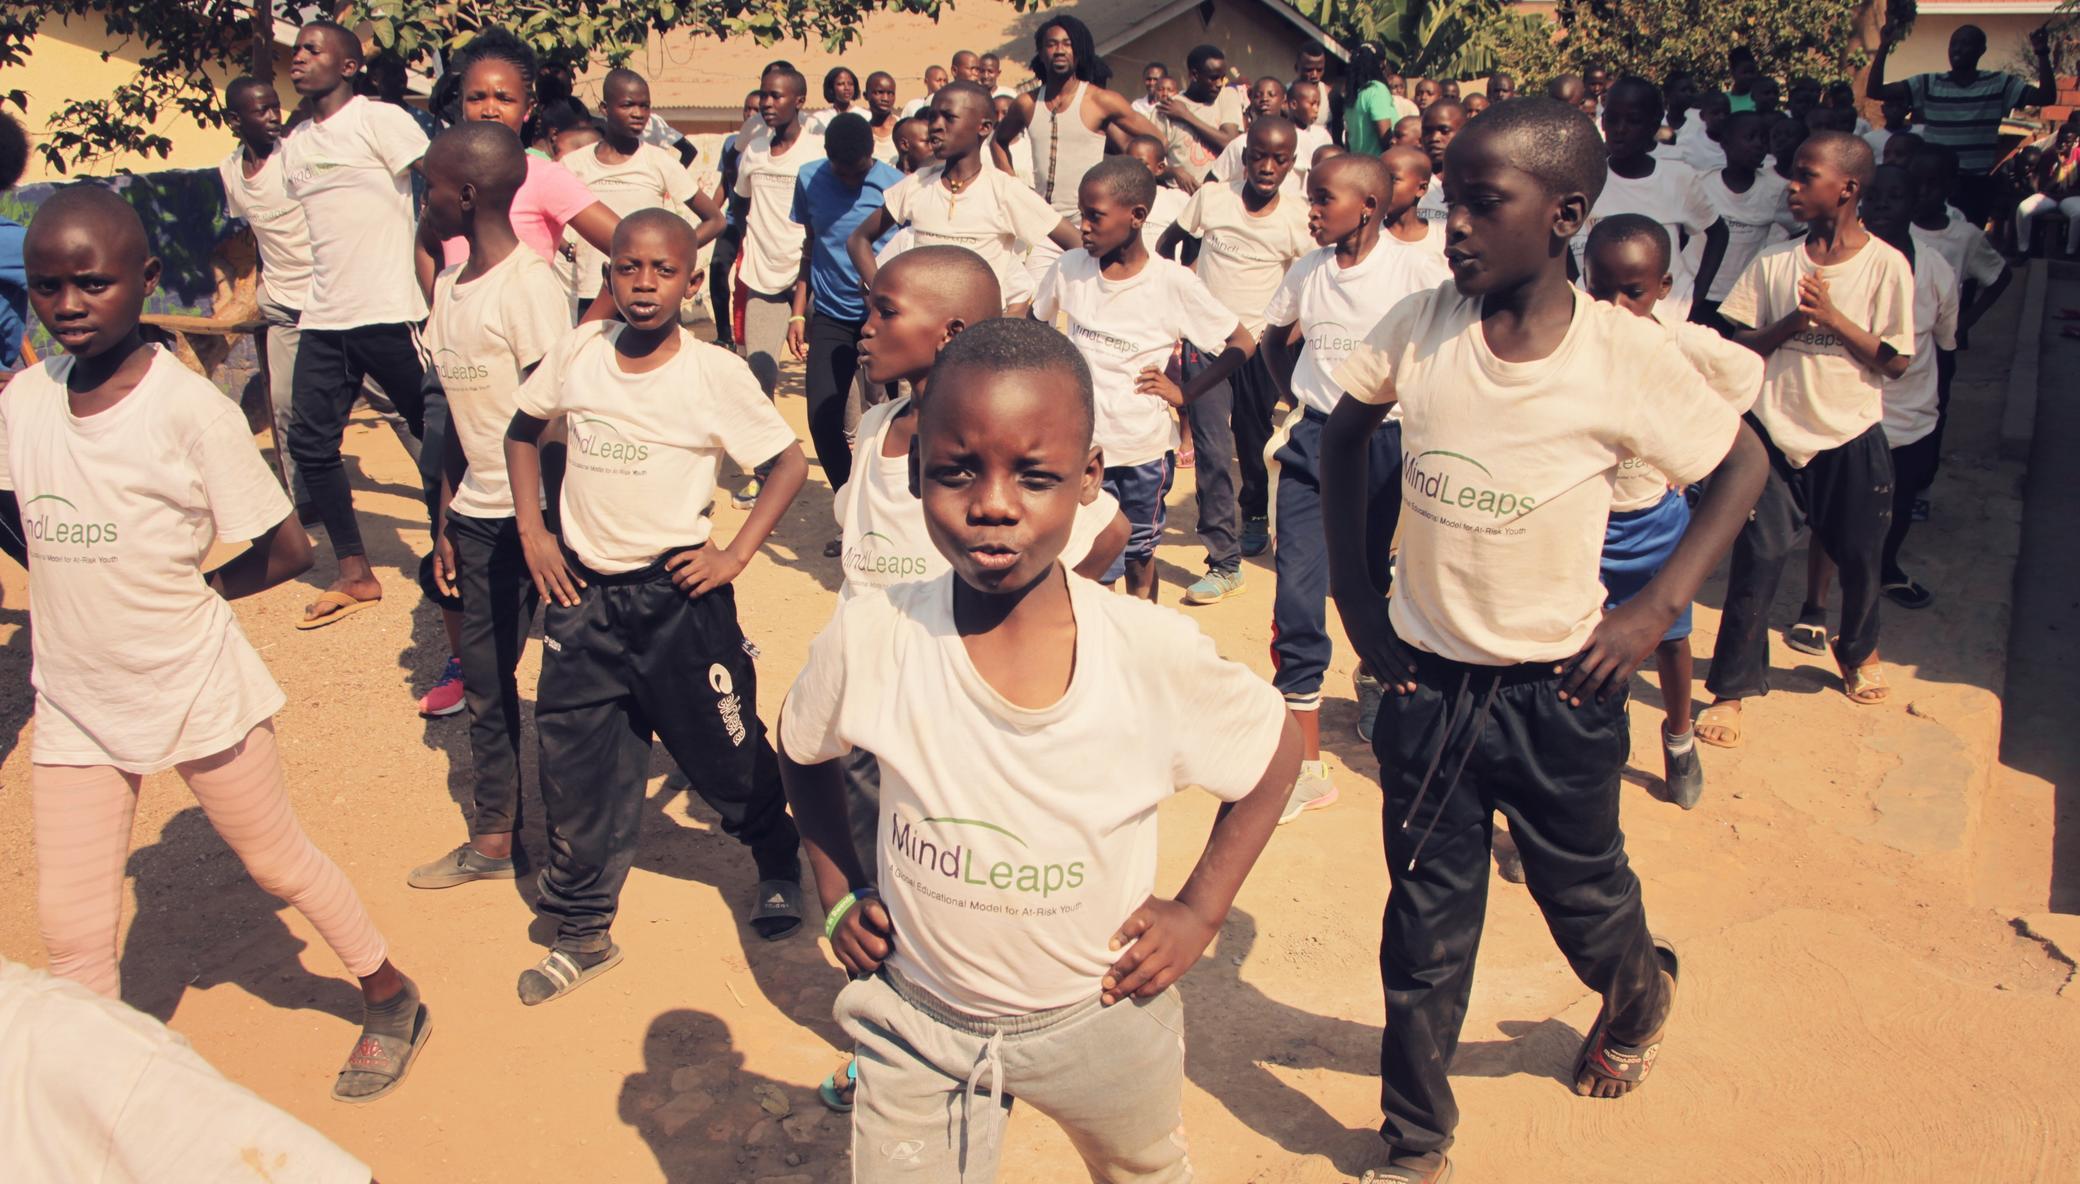 Empower Refugee Youth Through Dance